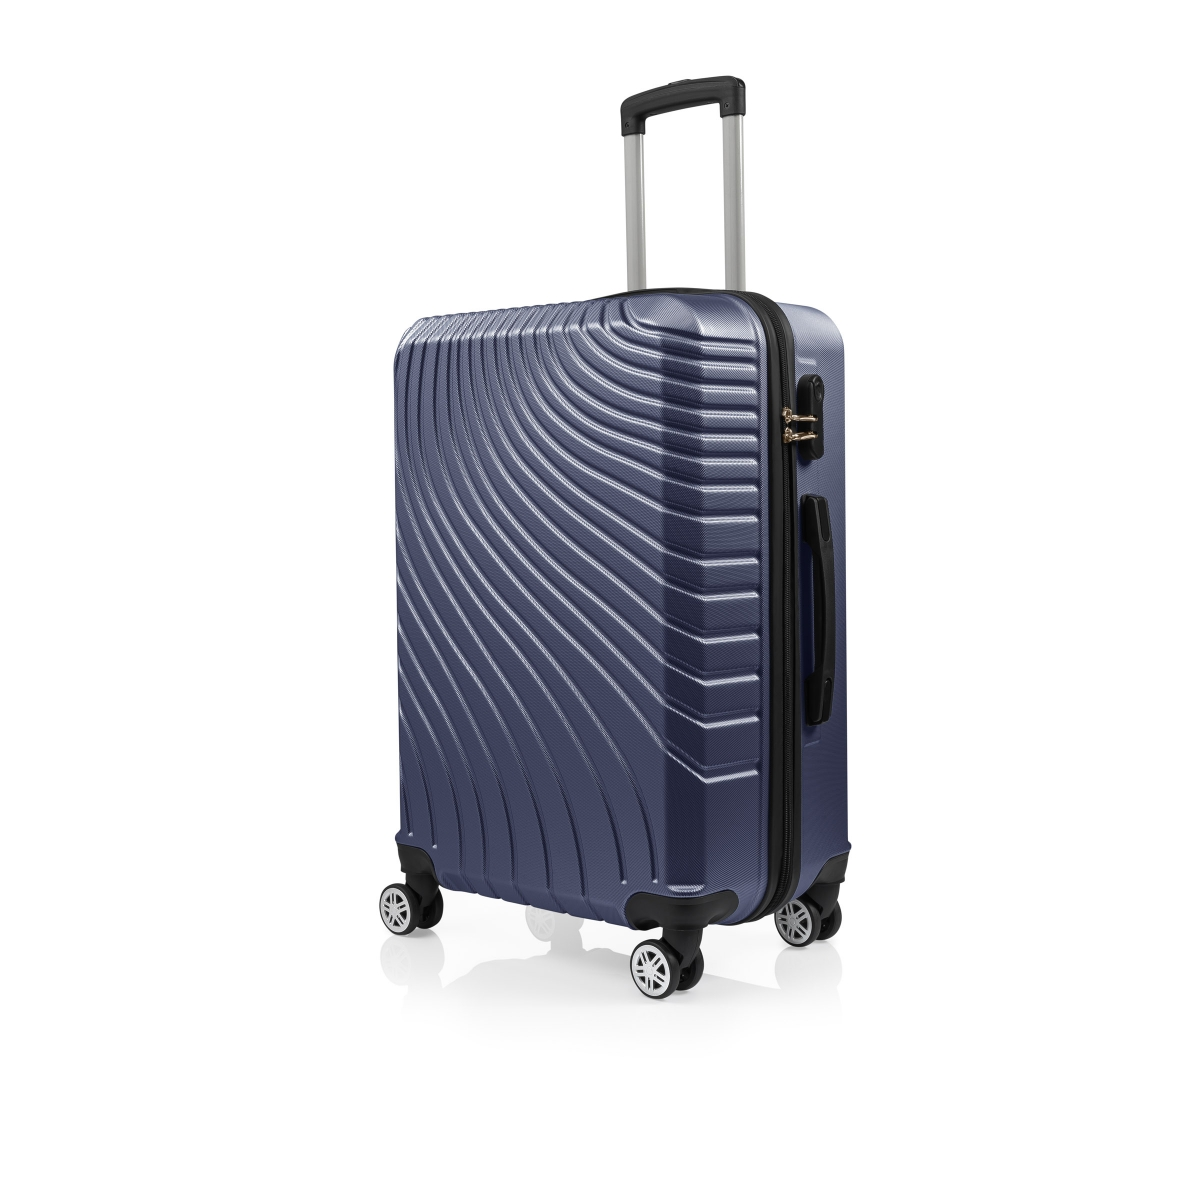 Gedox Abs 3'lü Valiz Seyahat Seti - Model:700.04 Lacivert